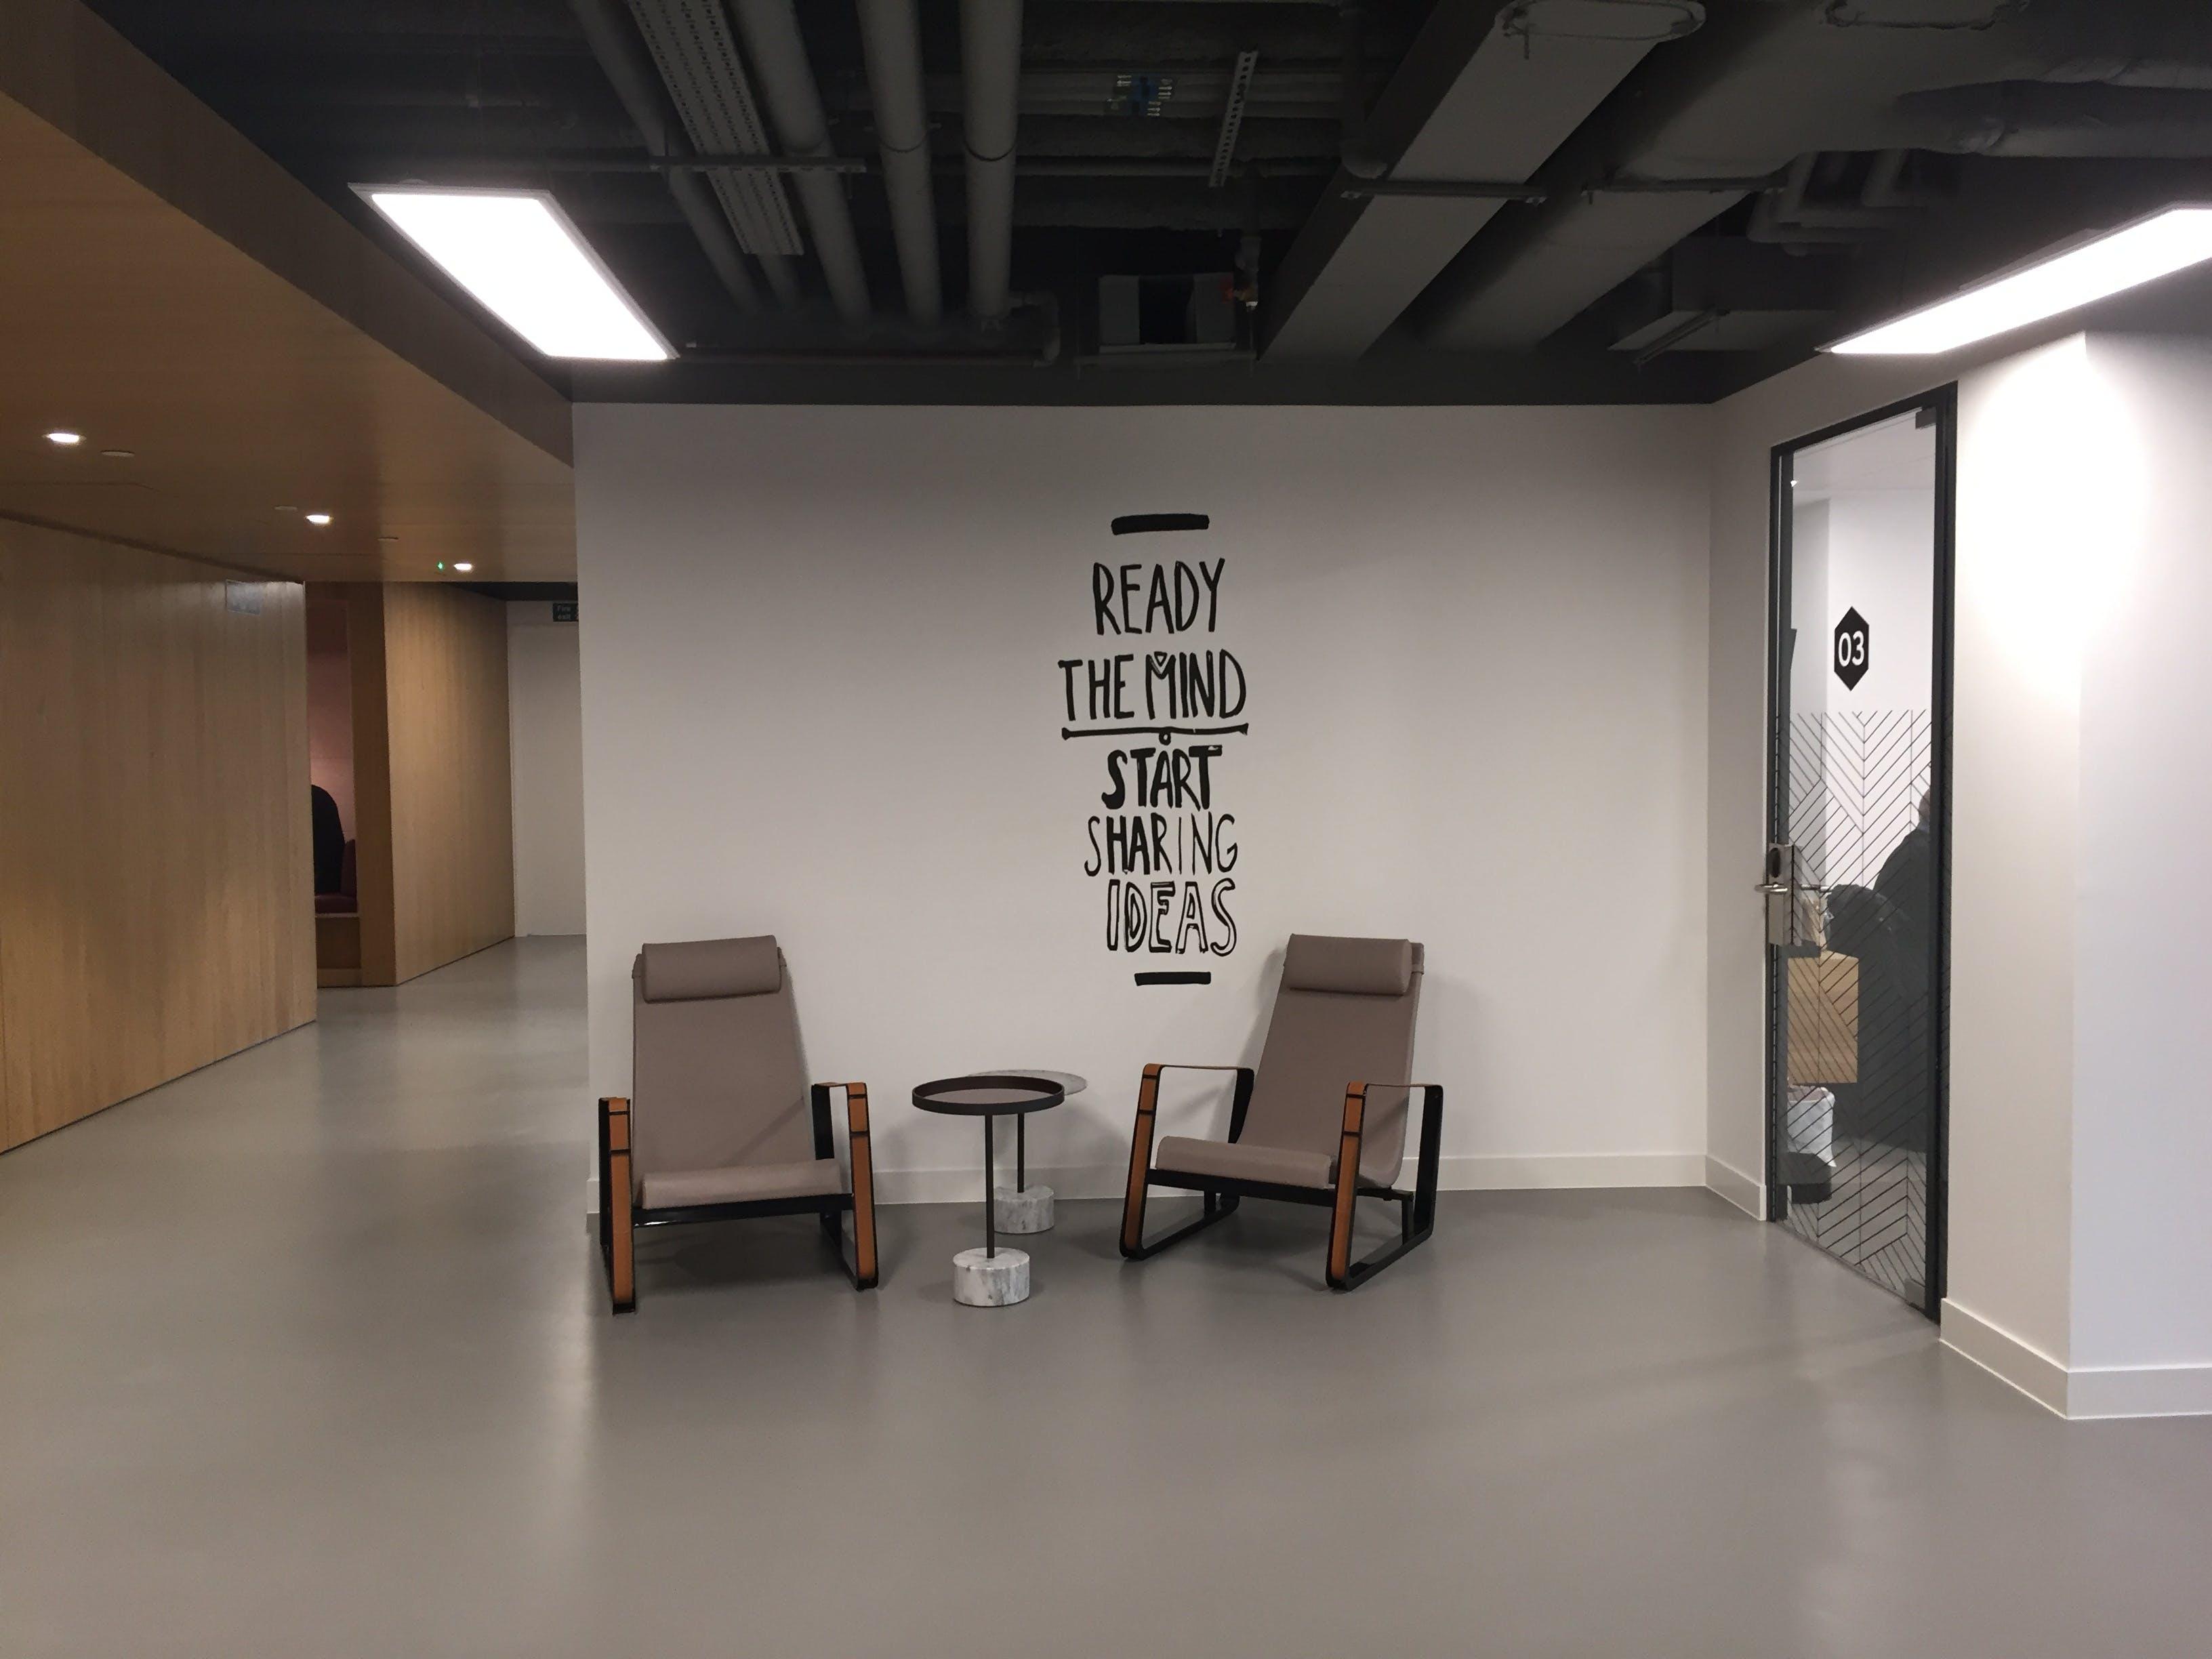 Breakout Area, business, Flexible Working